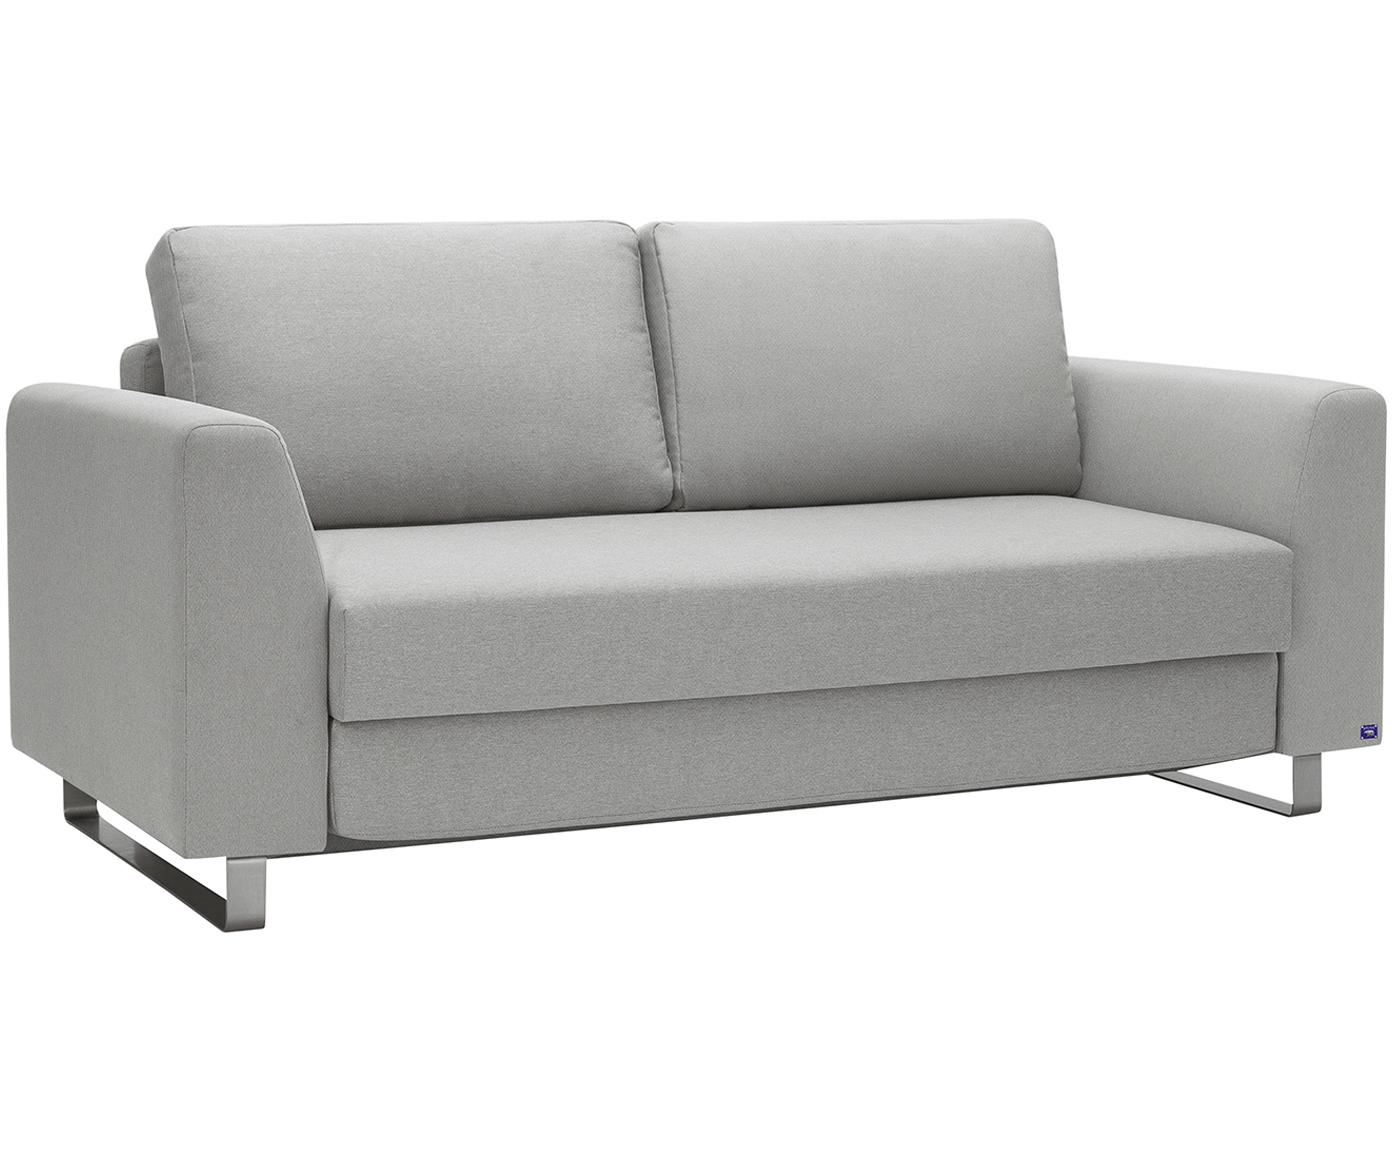 Schlafsofa Bruno (2-Sitzer), Bezug: Pflegeleichtes robustes P, Rahmen: Massivholz, Webstoff Hellgrau, B 180 x T 84 cm